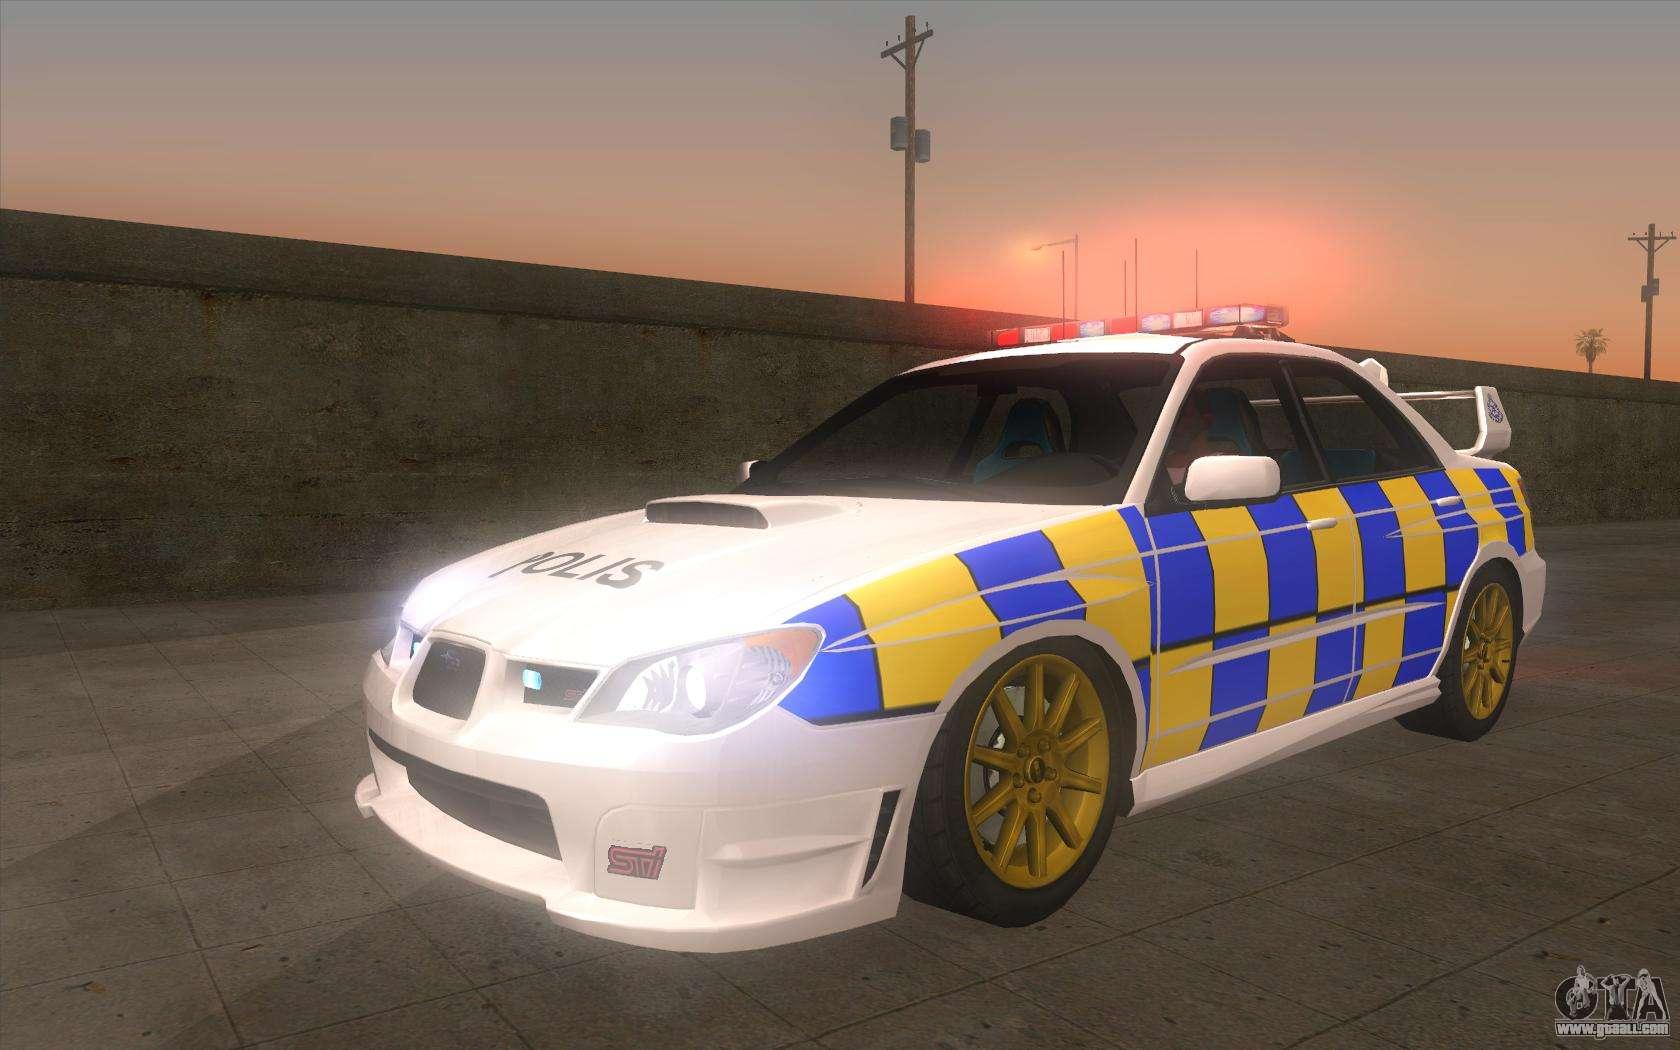 Img as well Grfuelflapspring likewise Matt Kwok Maypr besides Subaru Impreza Wrx Engine Throttle Body besides Large. on 2006 subaru impreza wrx sti mod